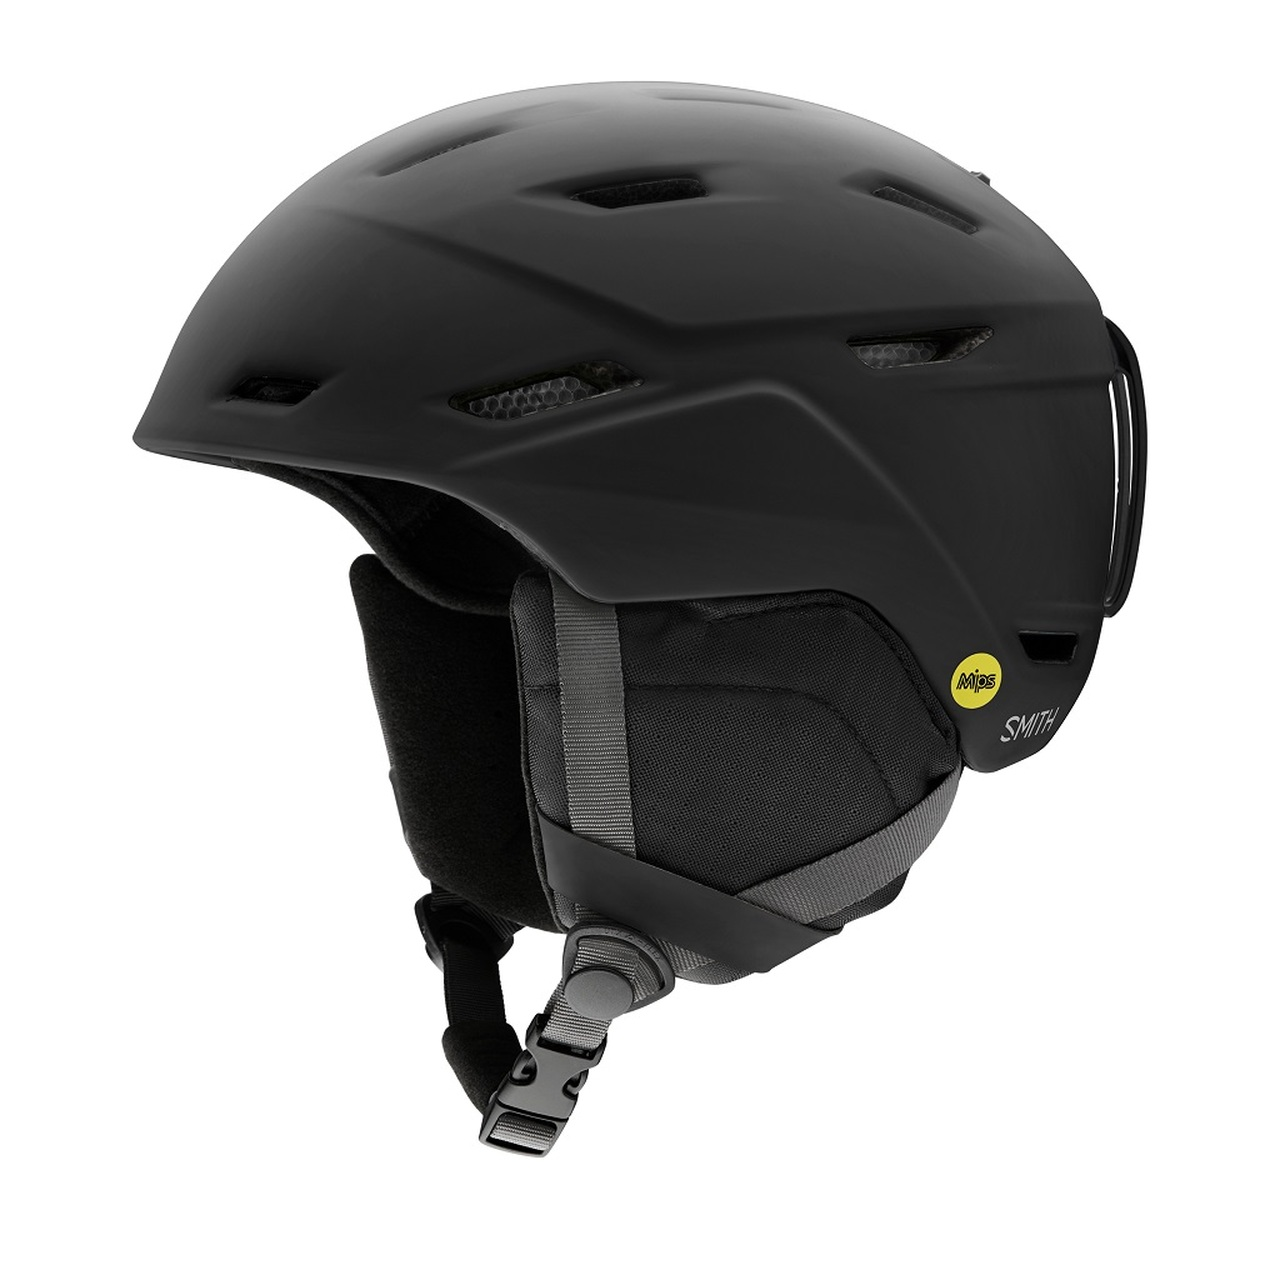 Matte Black - Smith Mission MIPS Helmet